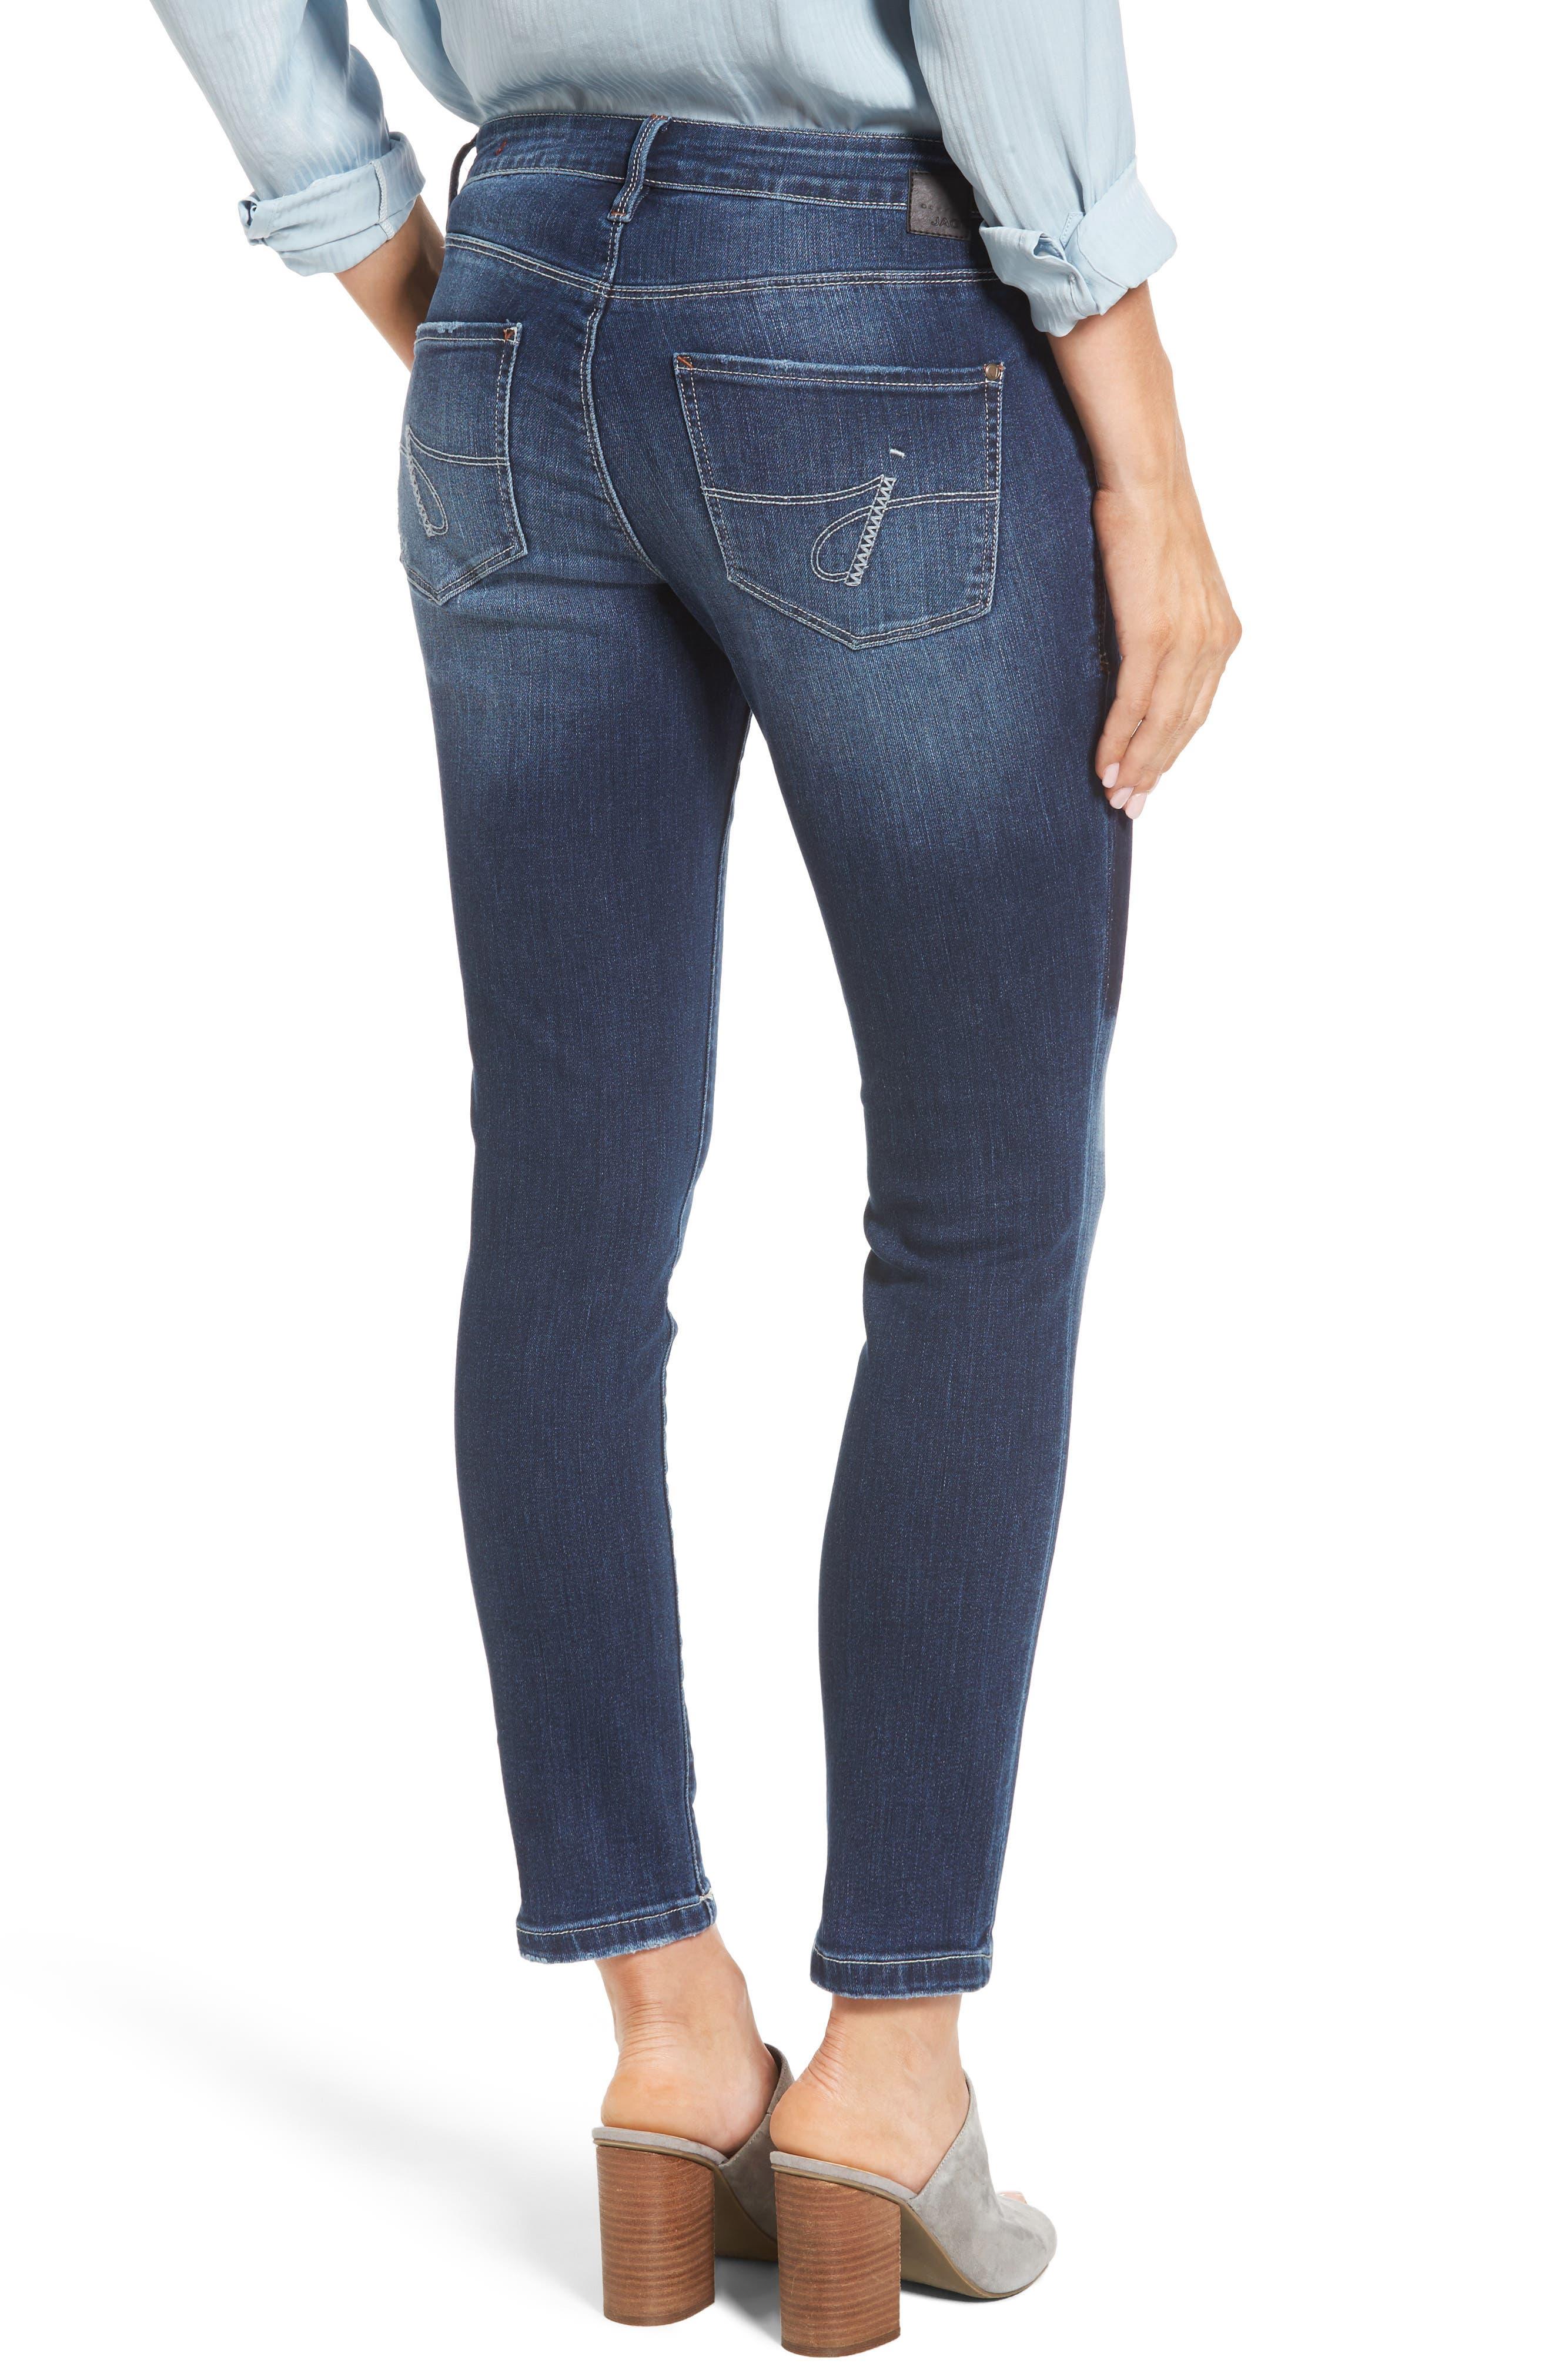 Mera Skinny Ankle Jeans,                             Alternate thumbnail 2, color,                             Bucket Blue